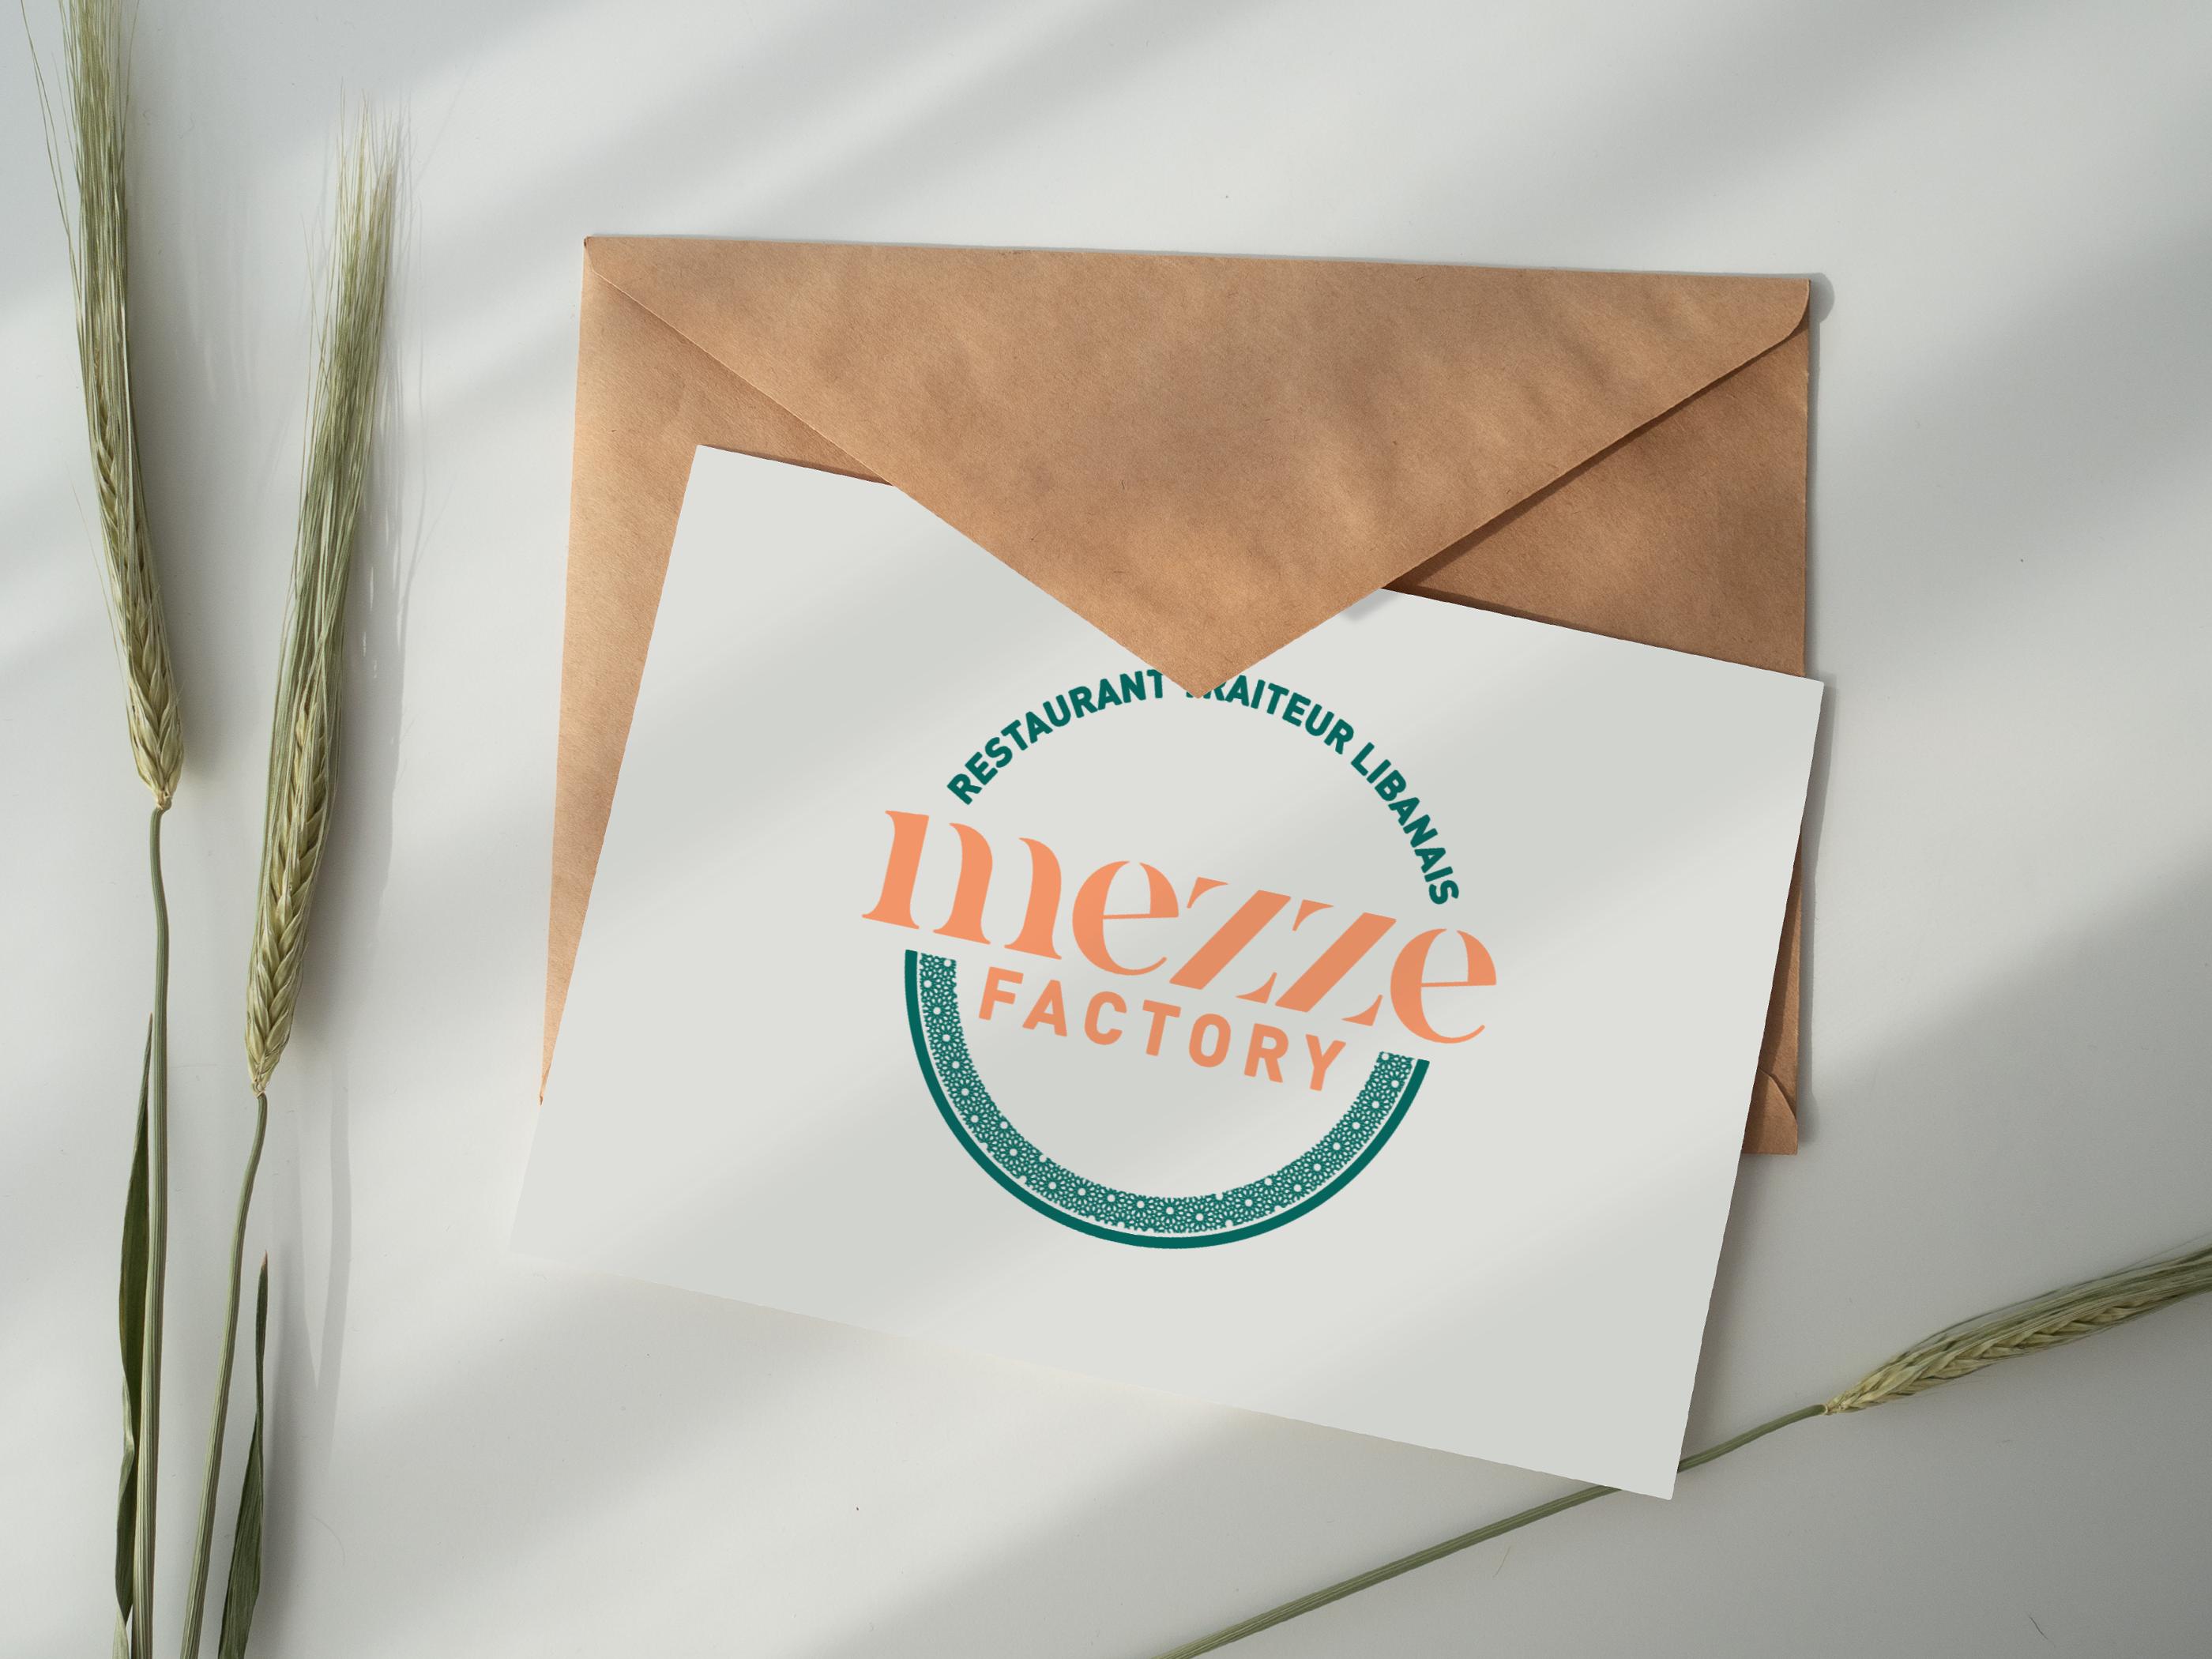 Logo Mezze Factory